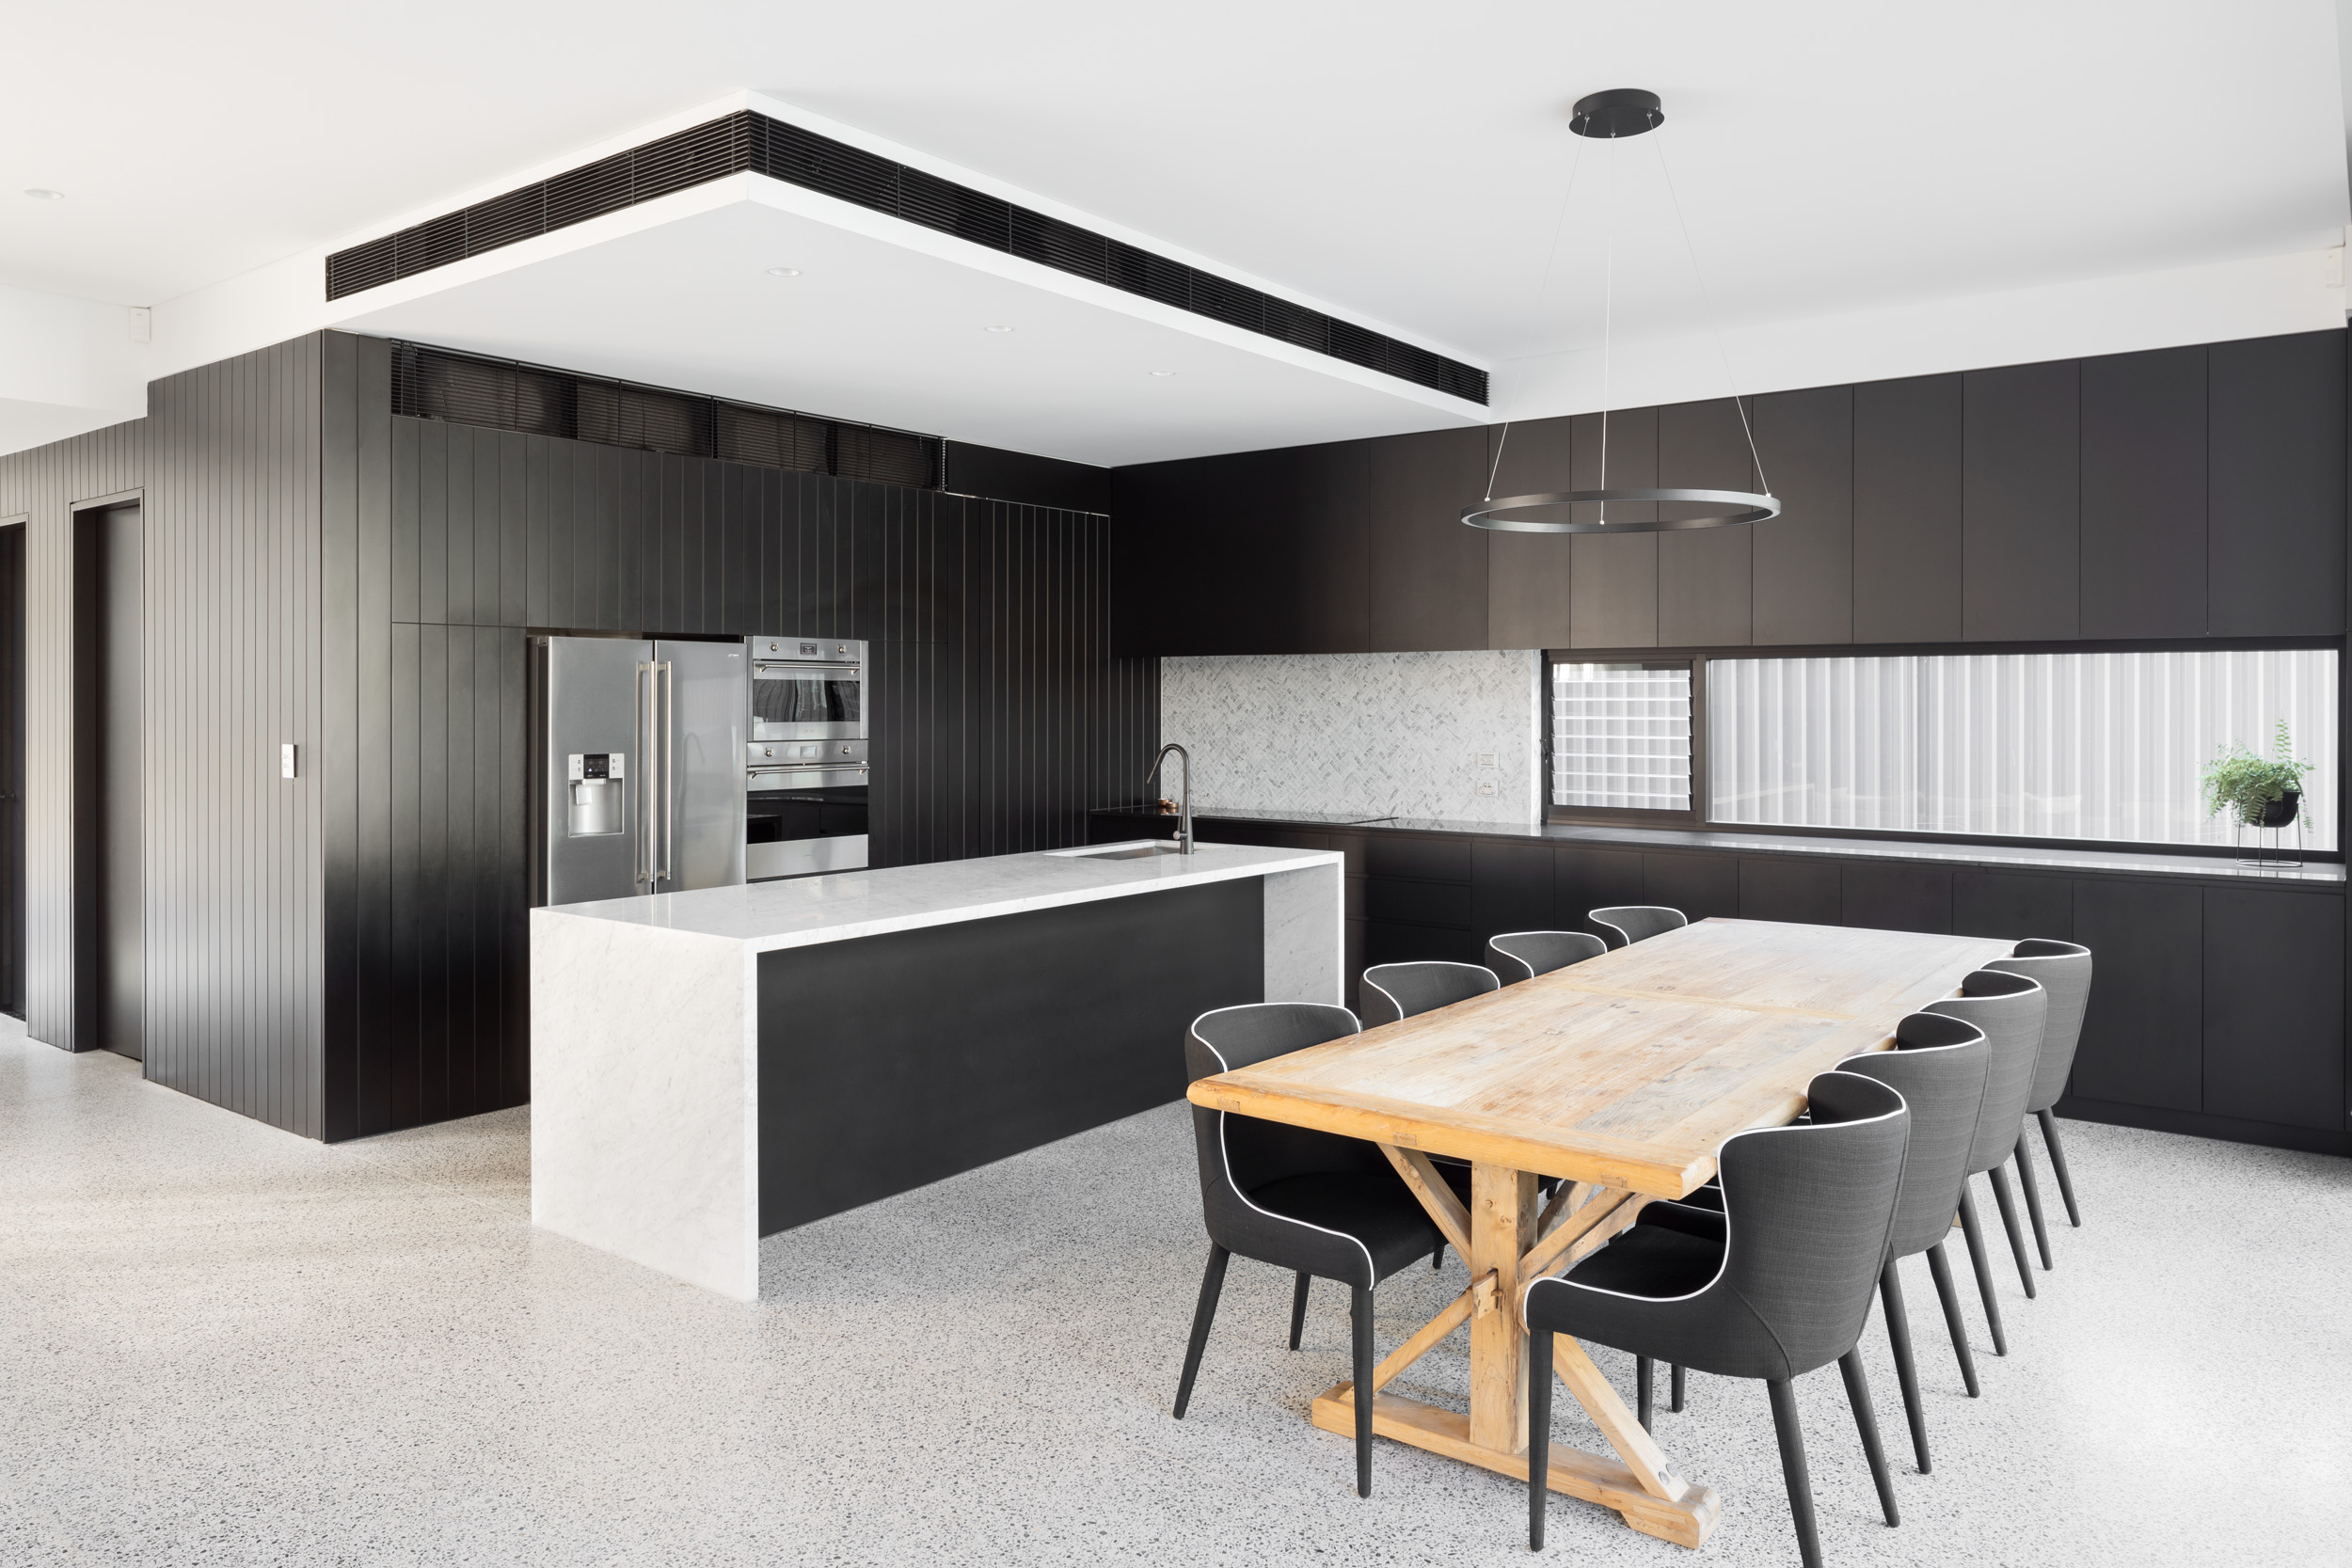 Jem_Cresswell_Architecture_Residential_Photographer_Sydney_Australia_021.jpg